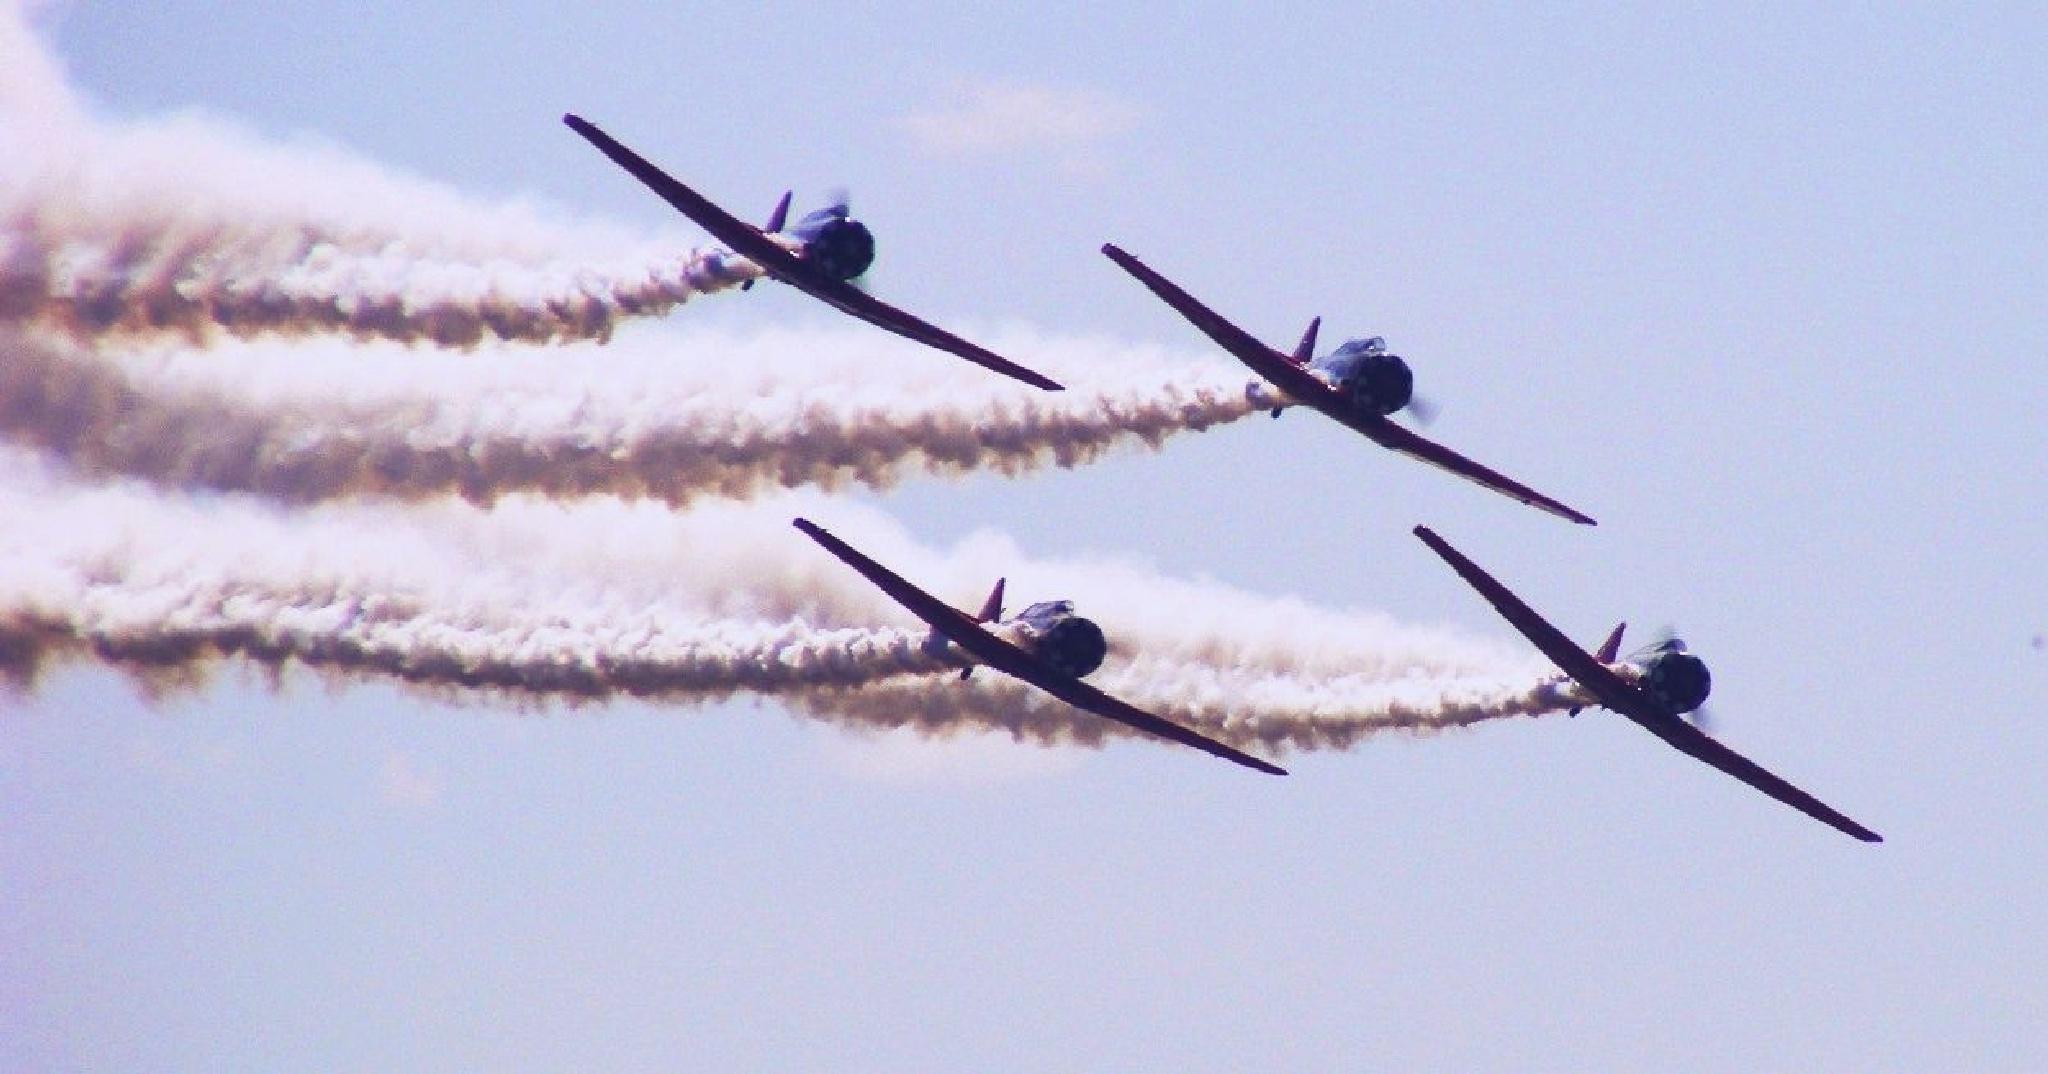 Formation Flying by Alex Ingram